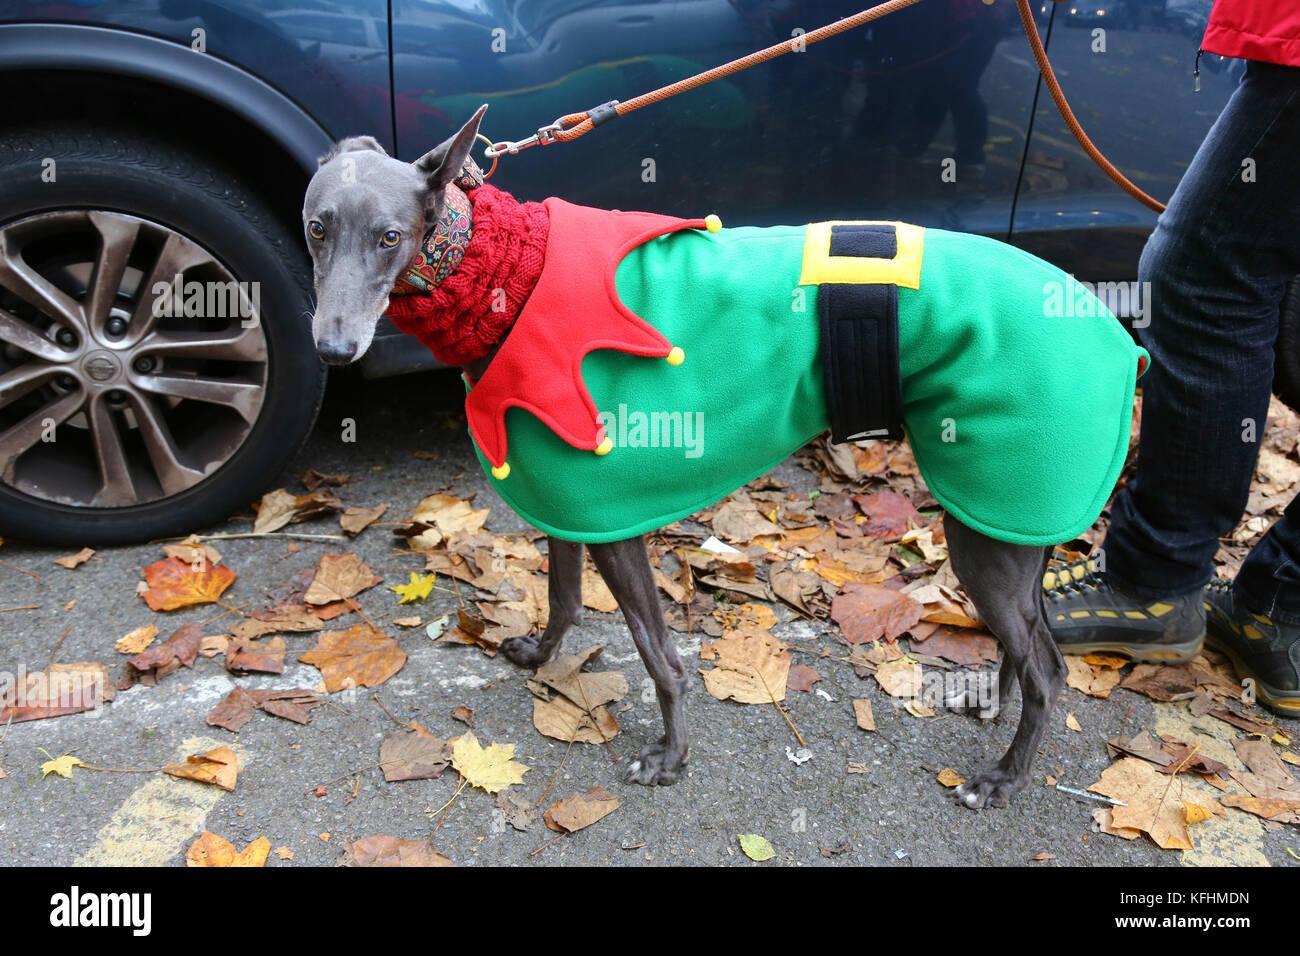 London, UK. 29th Oct, 2017. 99 The Greyhound Looks Elegant In Green